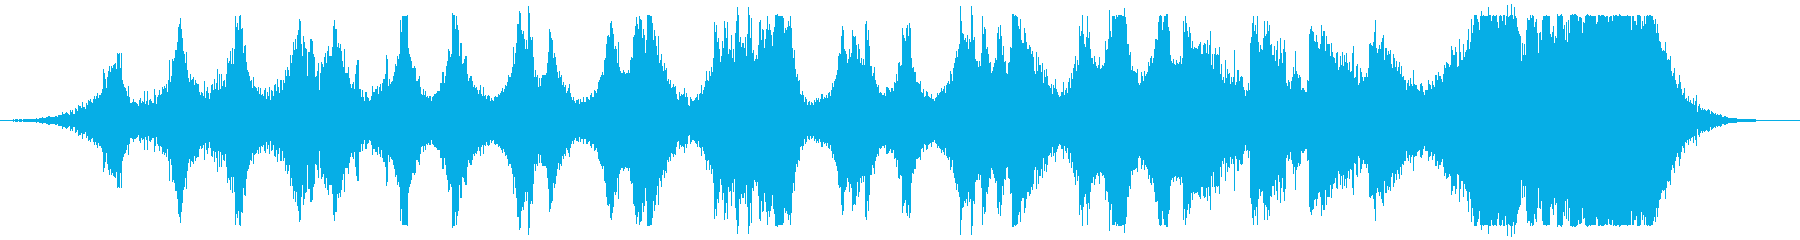 Metal Swishes、Met...の再生済みの波形